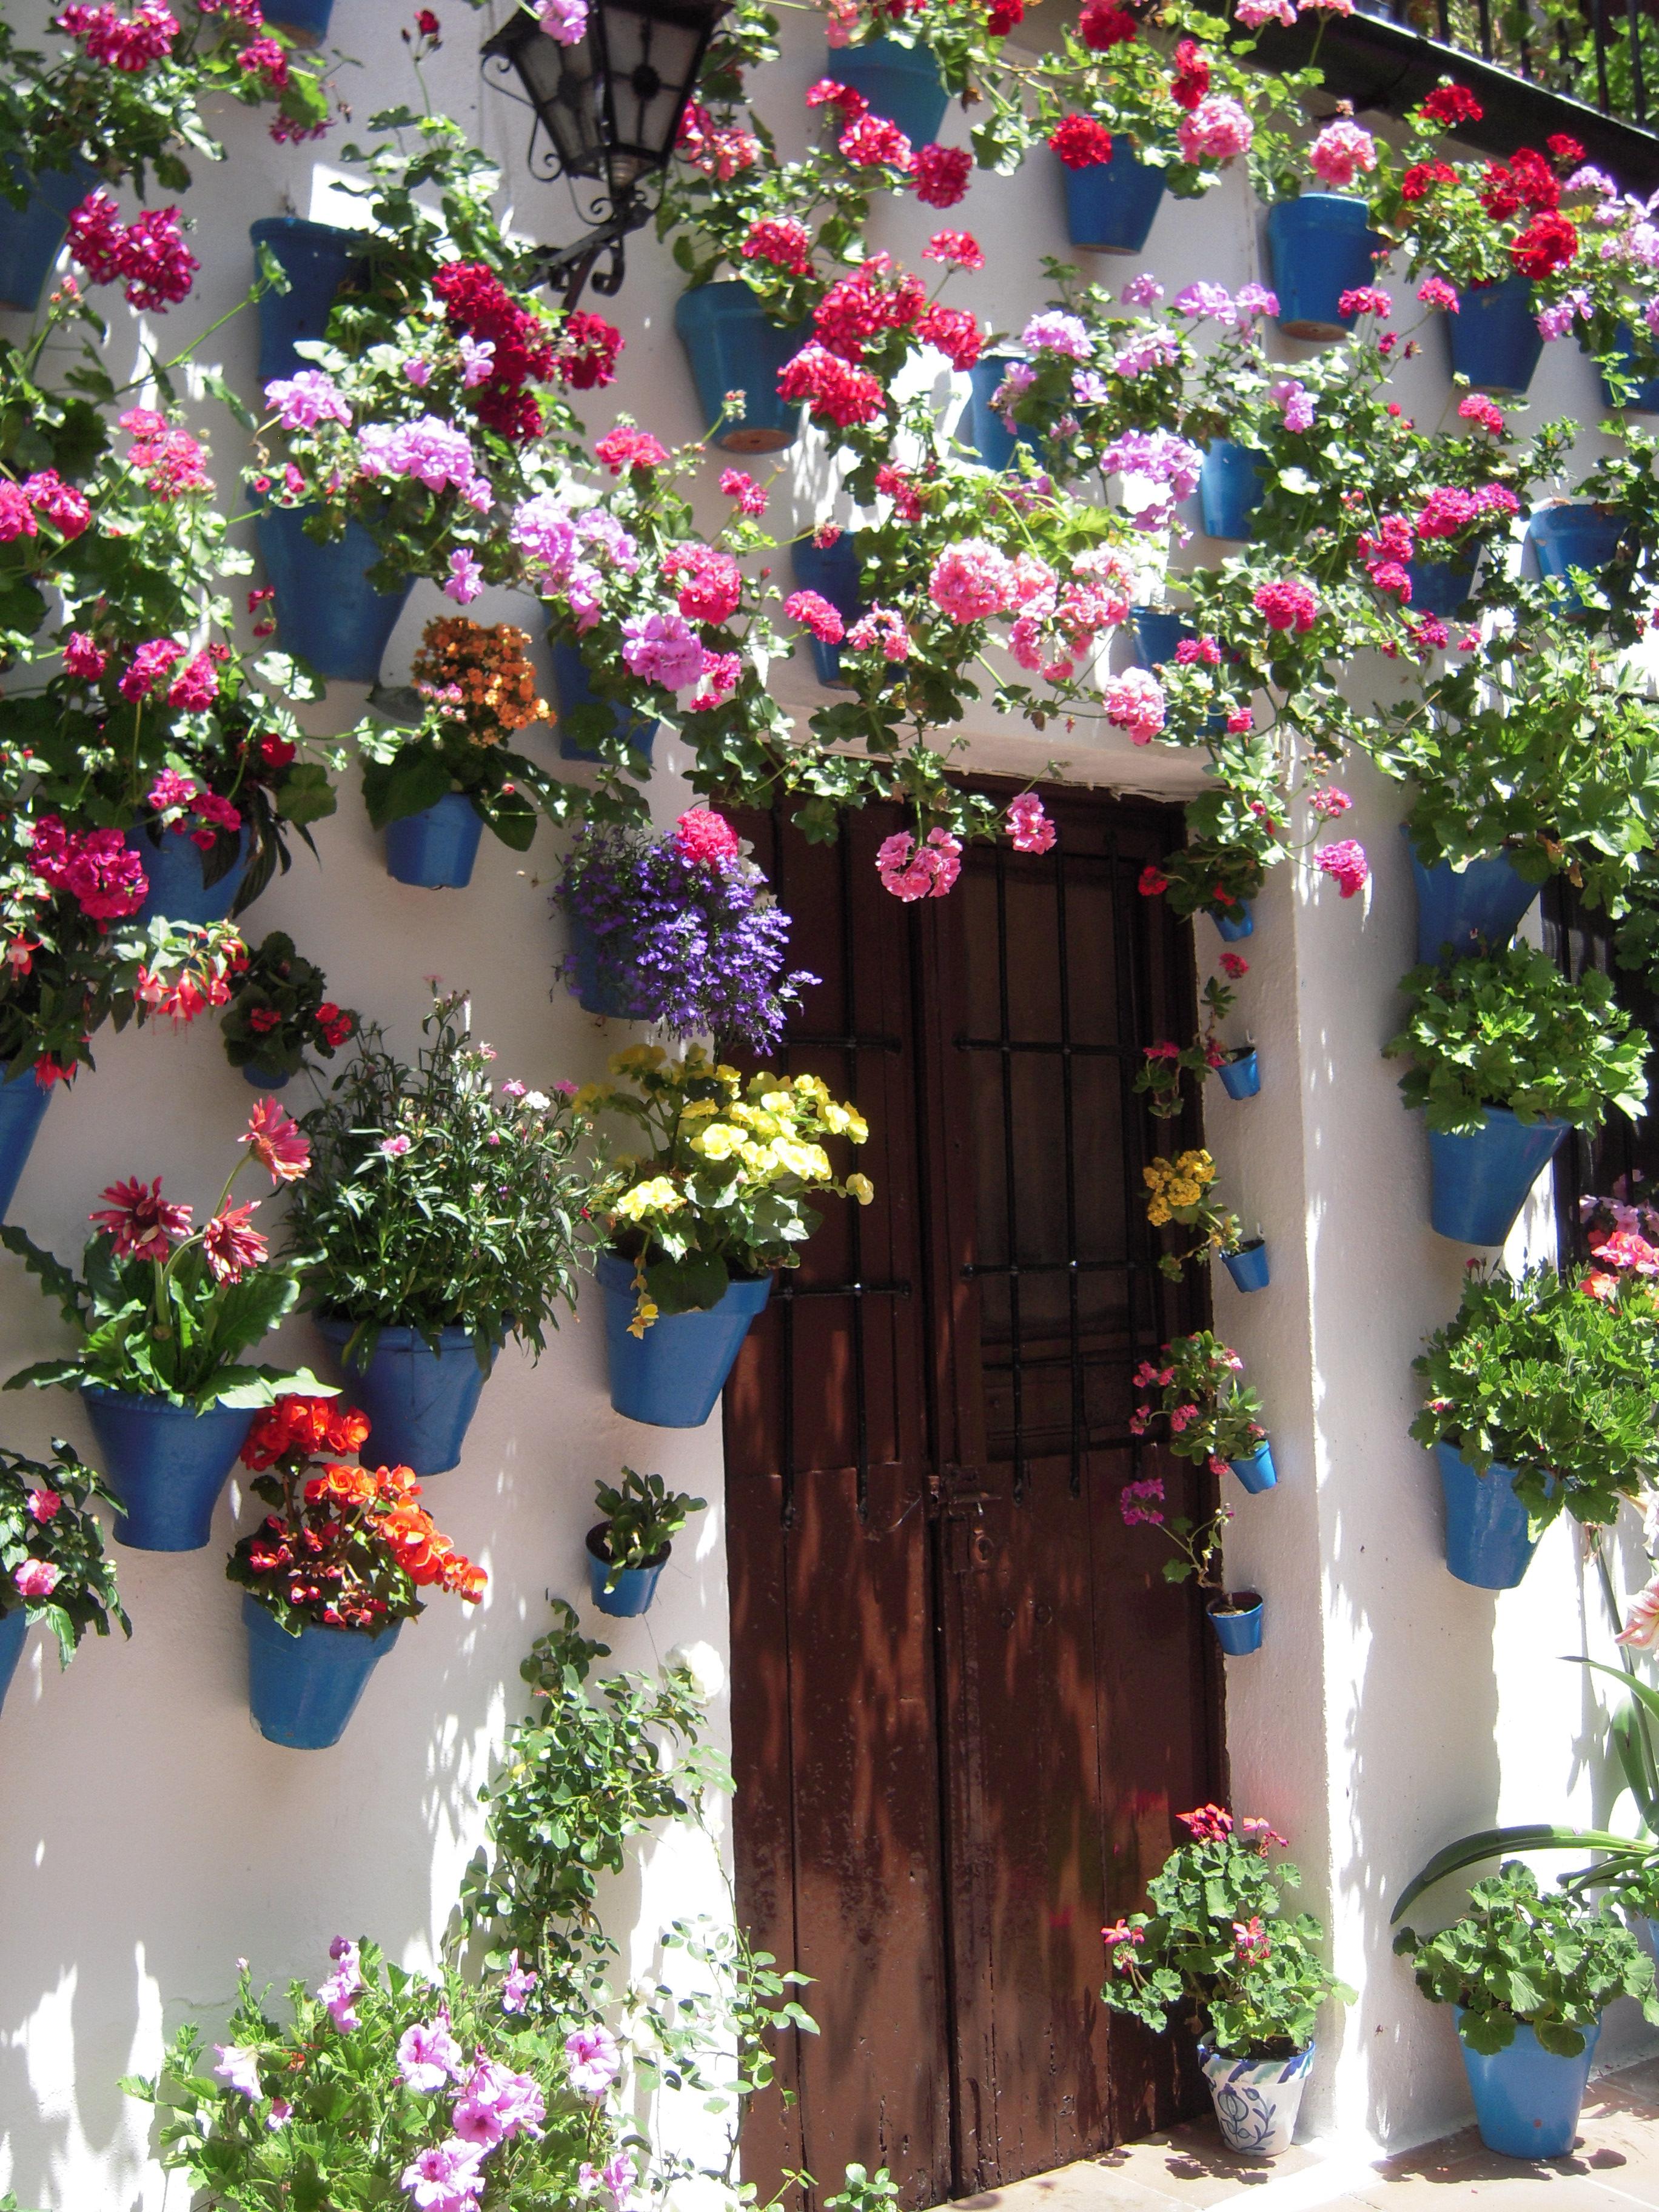 File concurso de patios wikimedia commons - Imagenes de patios andaluces ...